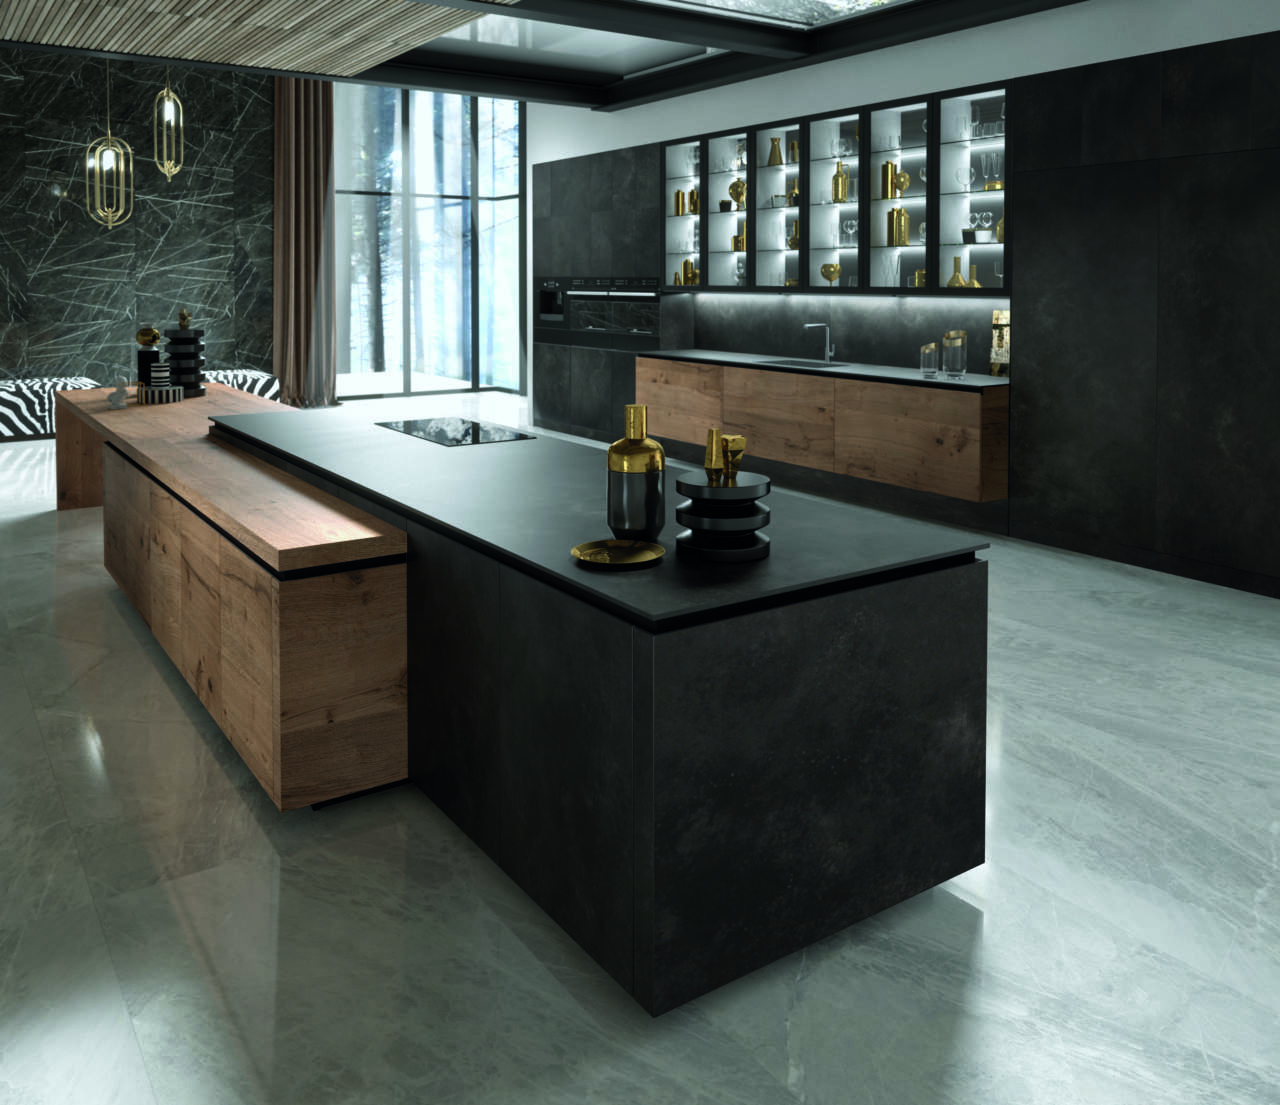 Anteprima eurocucina 2018 snaidero ambiente cucina for Aziende cucine design